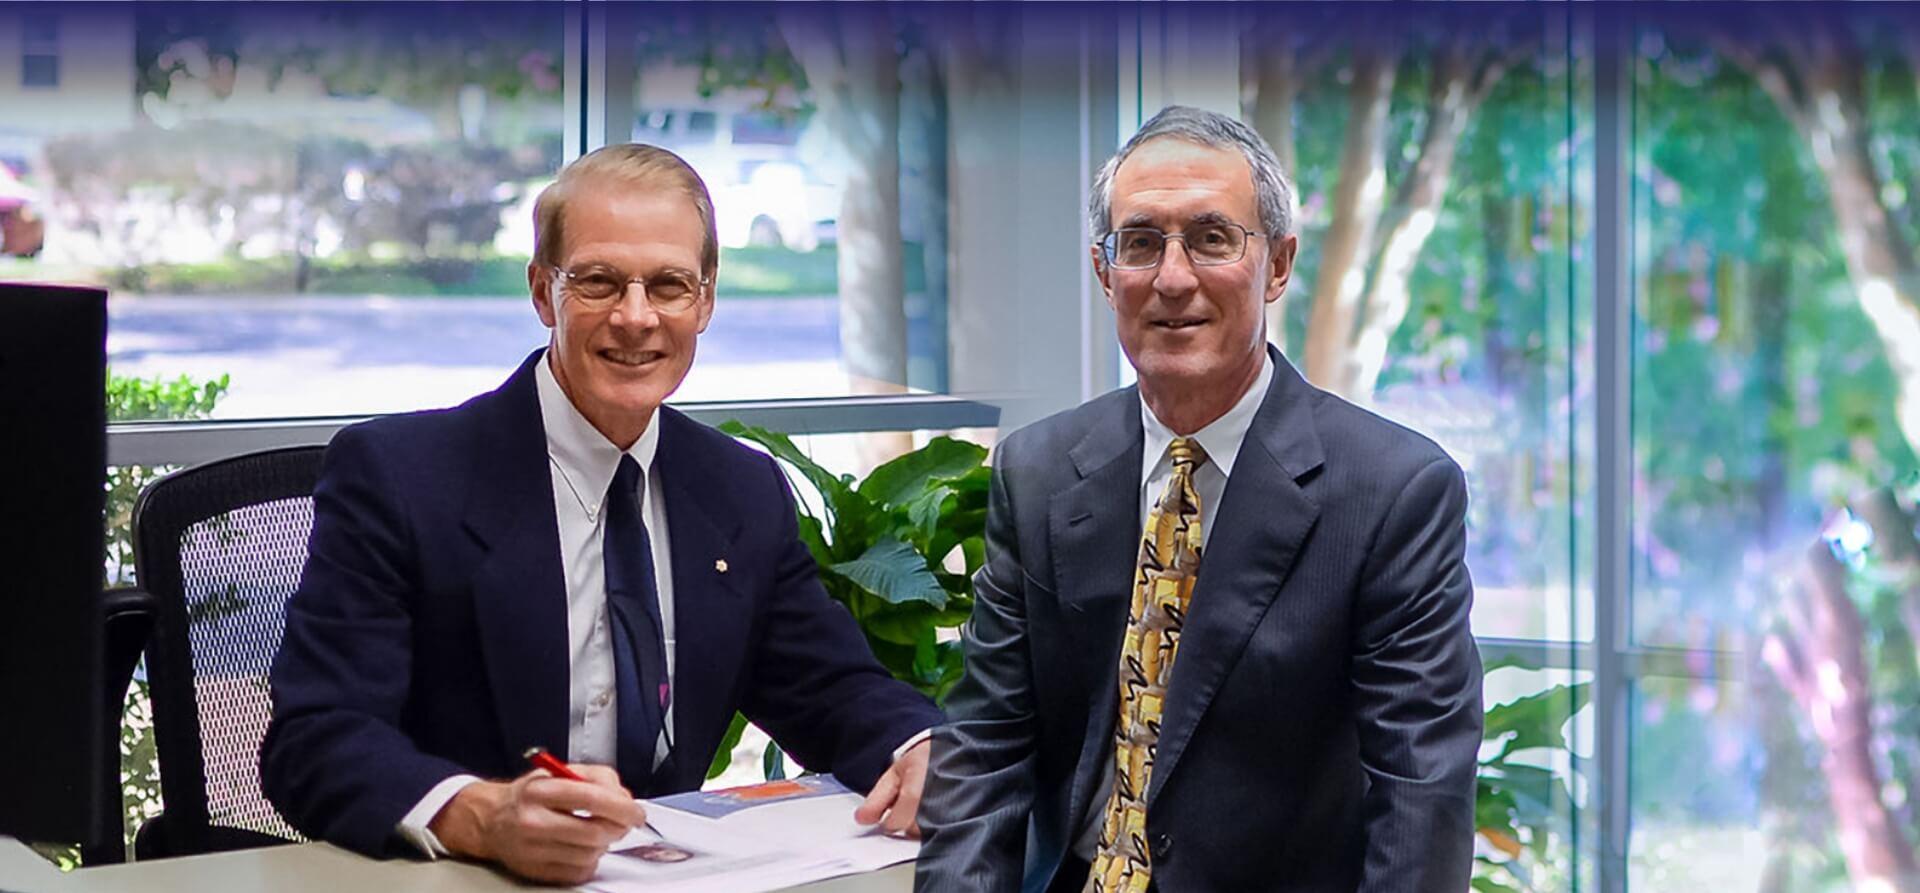 Dr. Rick Davis and Dr. Rick Schwartz